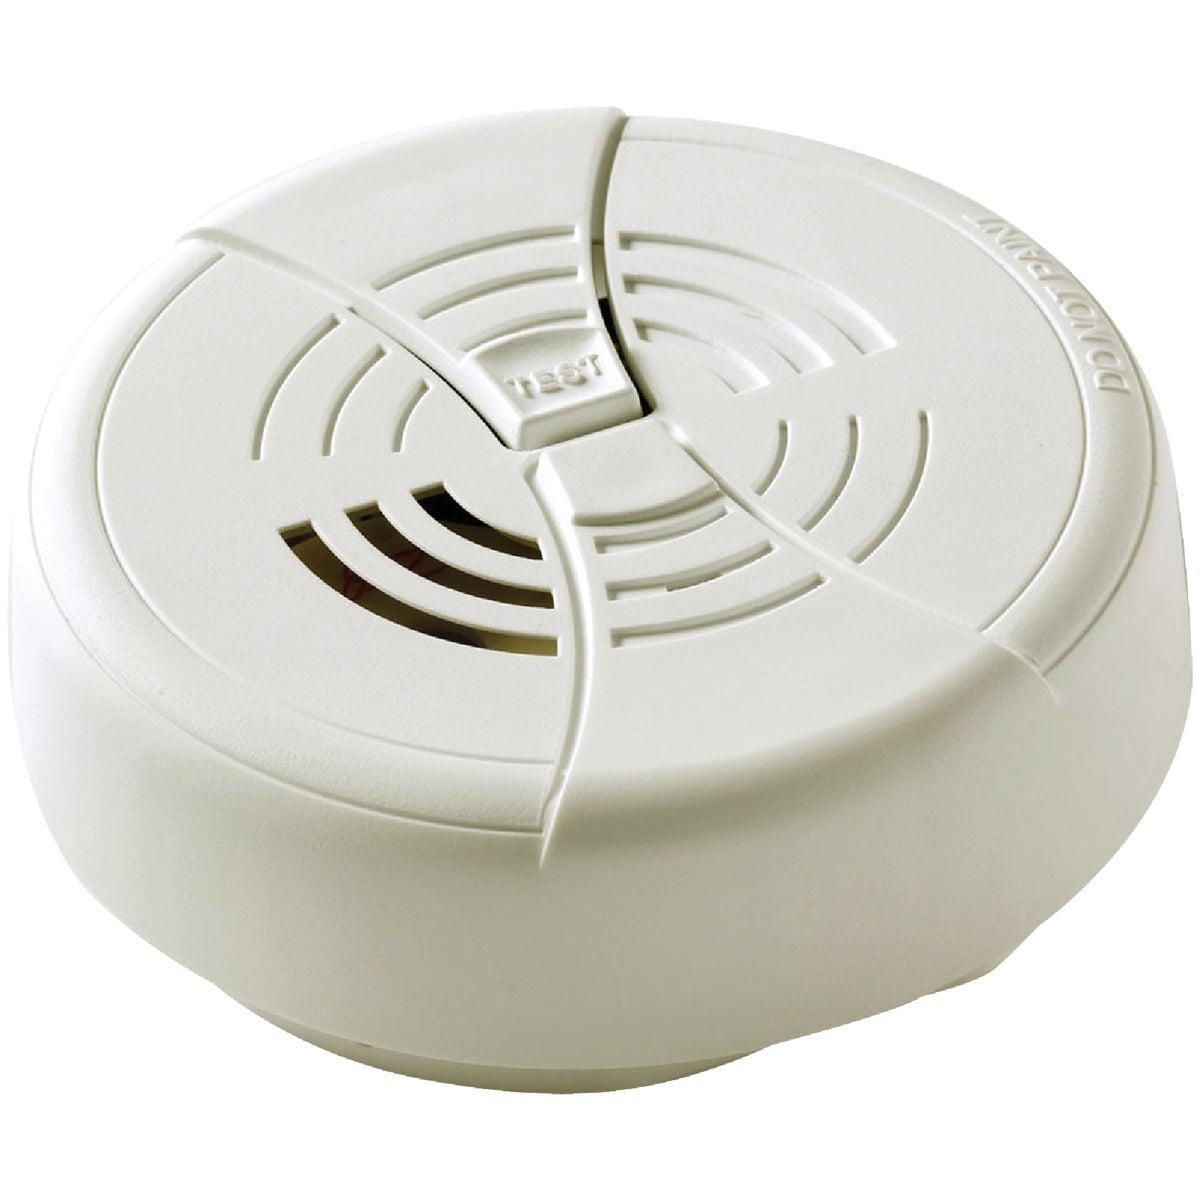 2Pk Smoke Alarm W/Battry